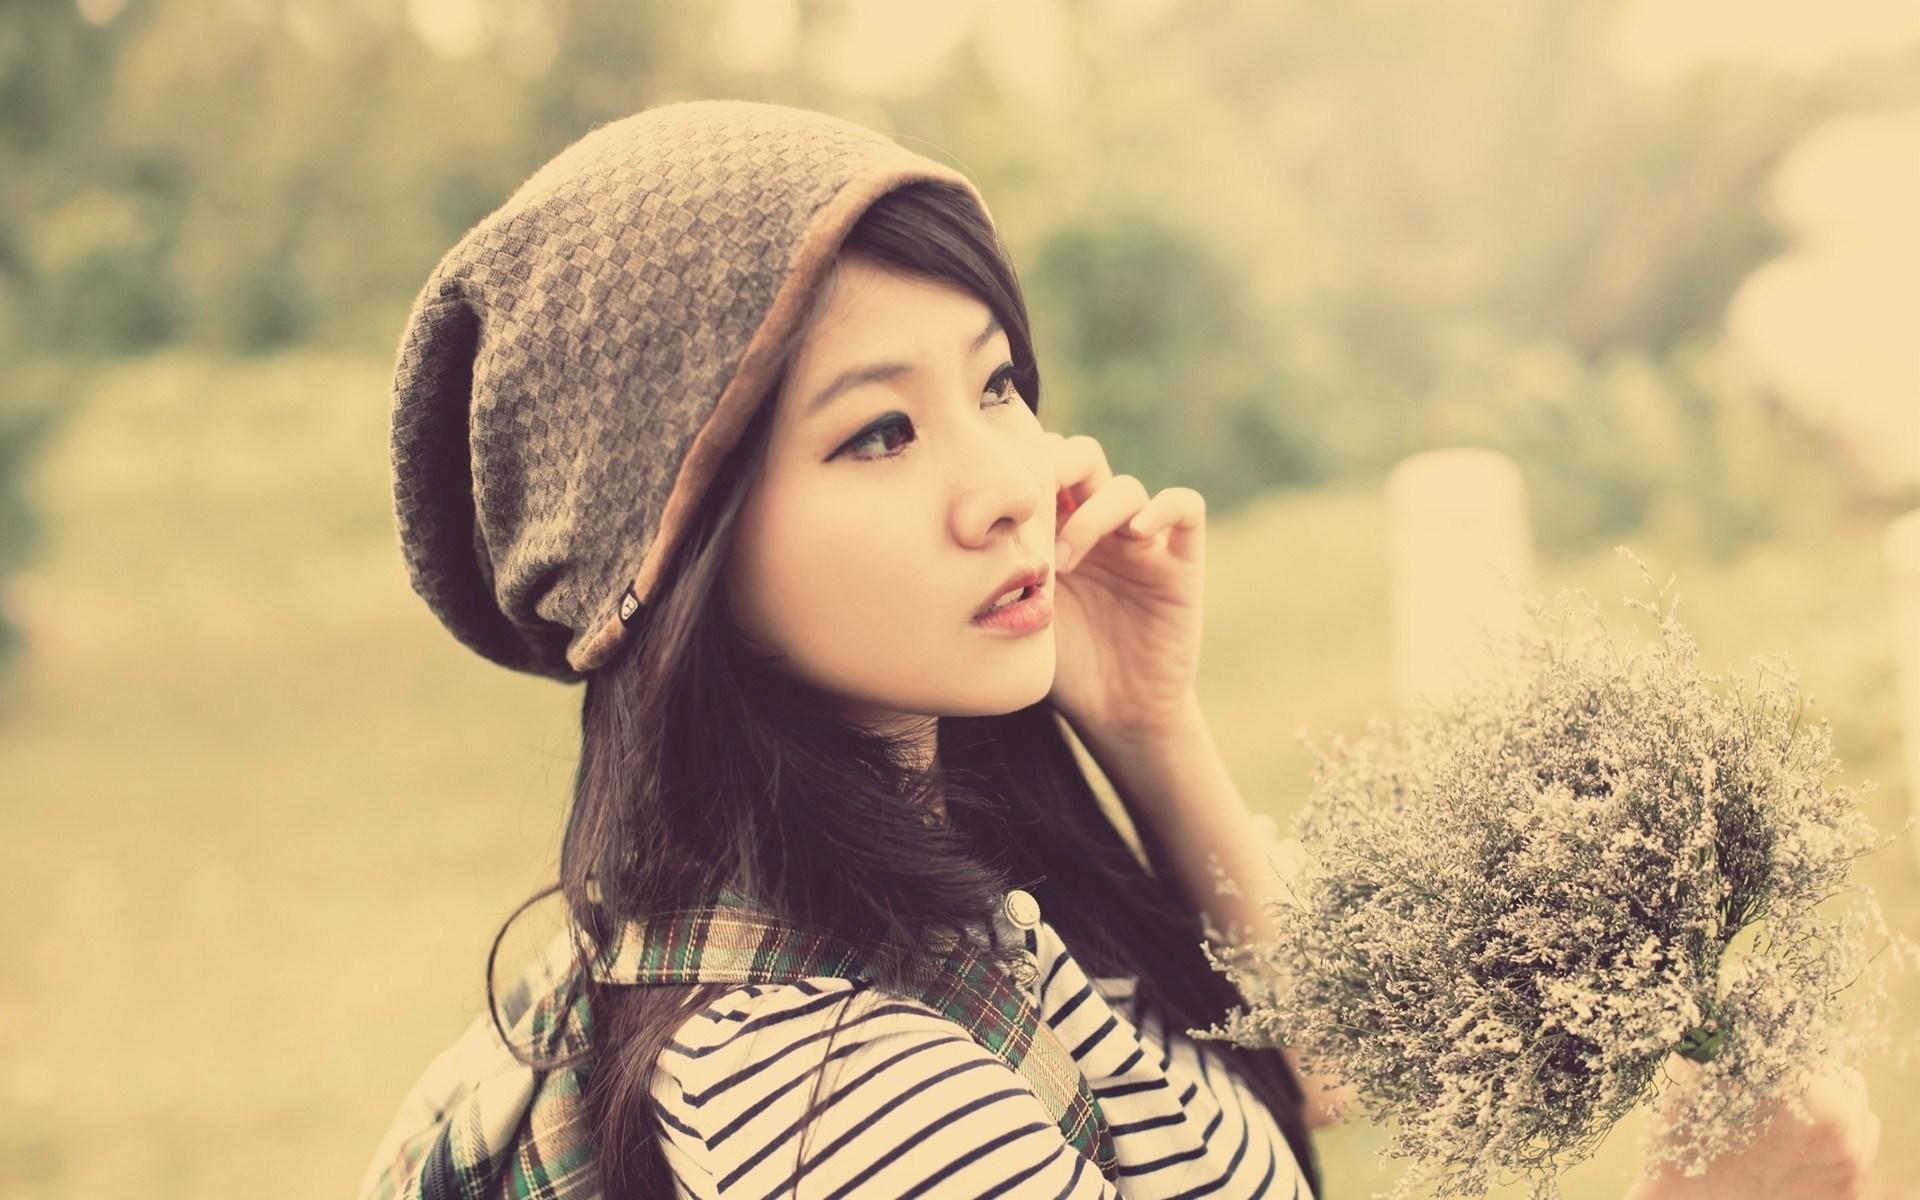 Beautiful Brunette Asian Girl Photo HD Wallpaper